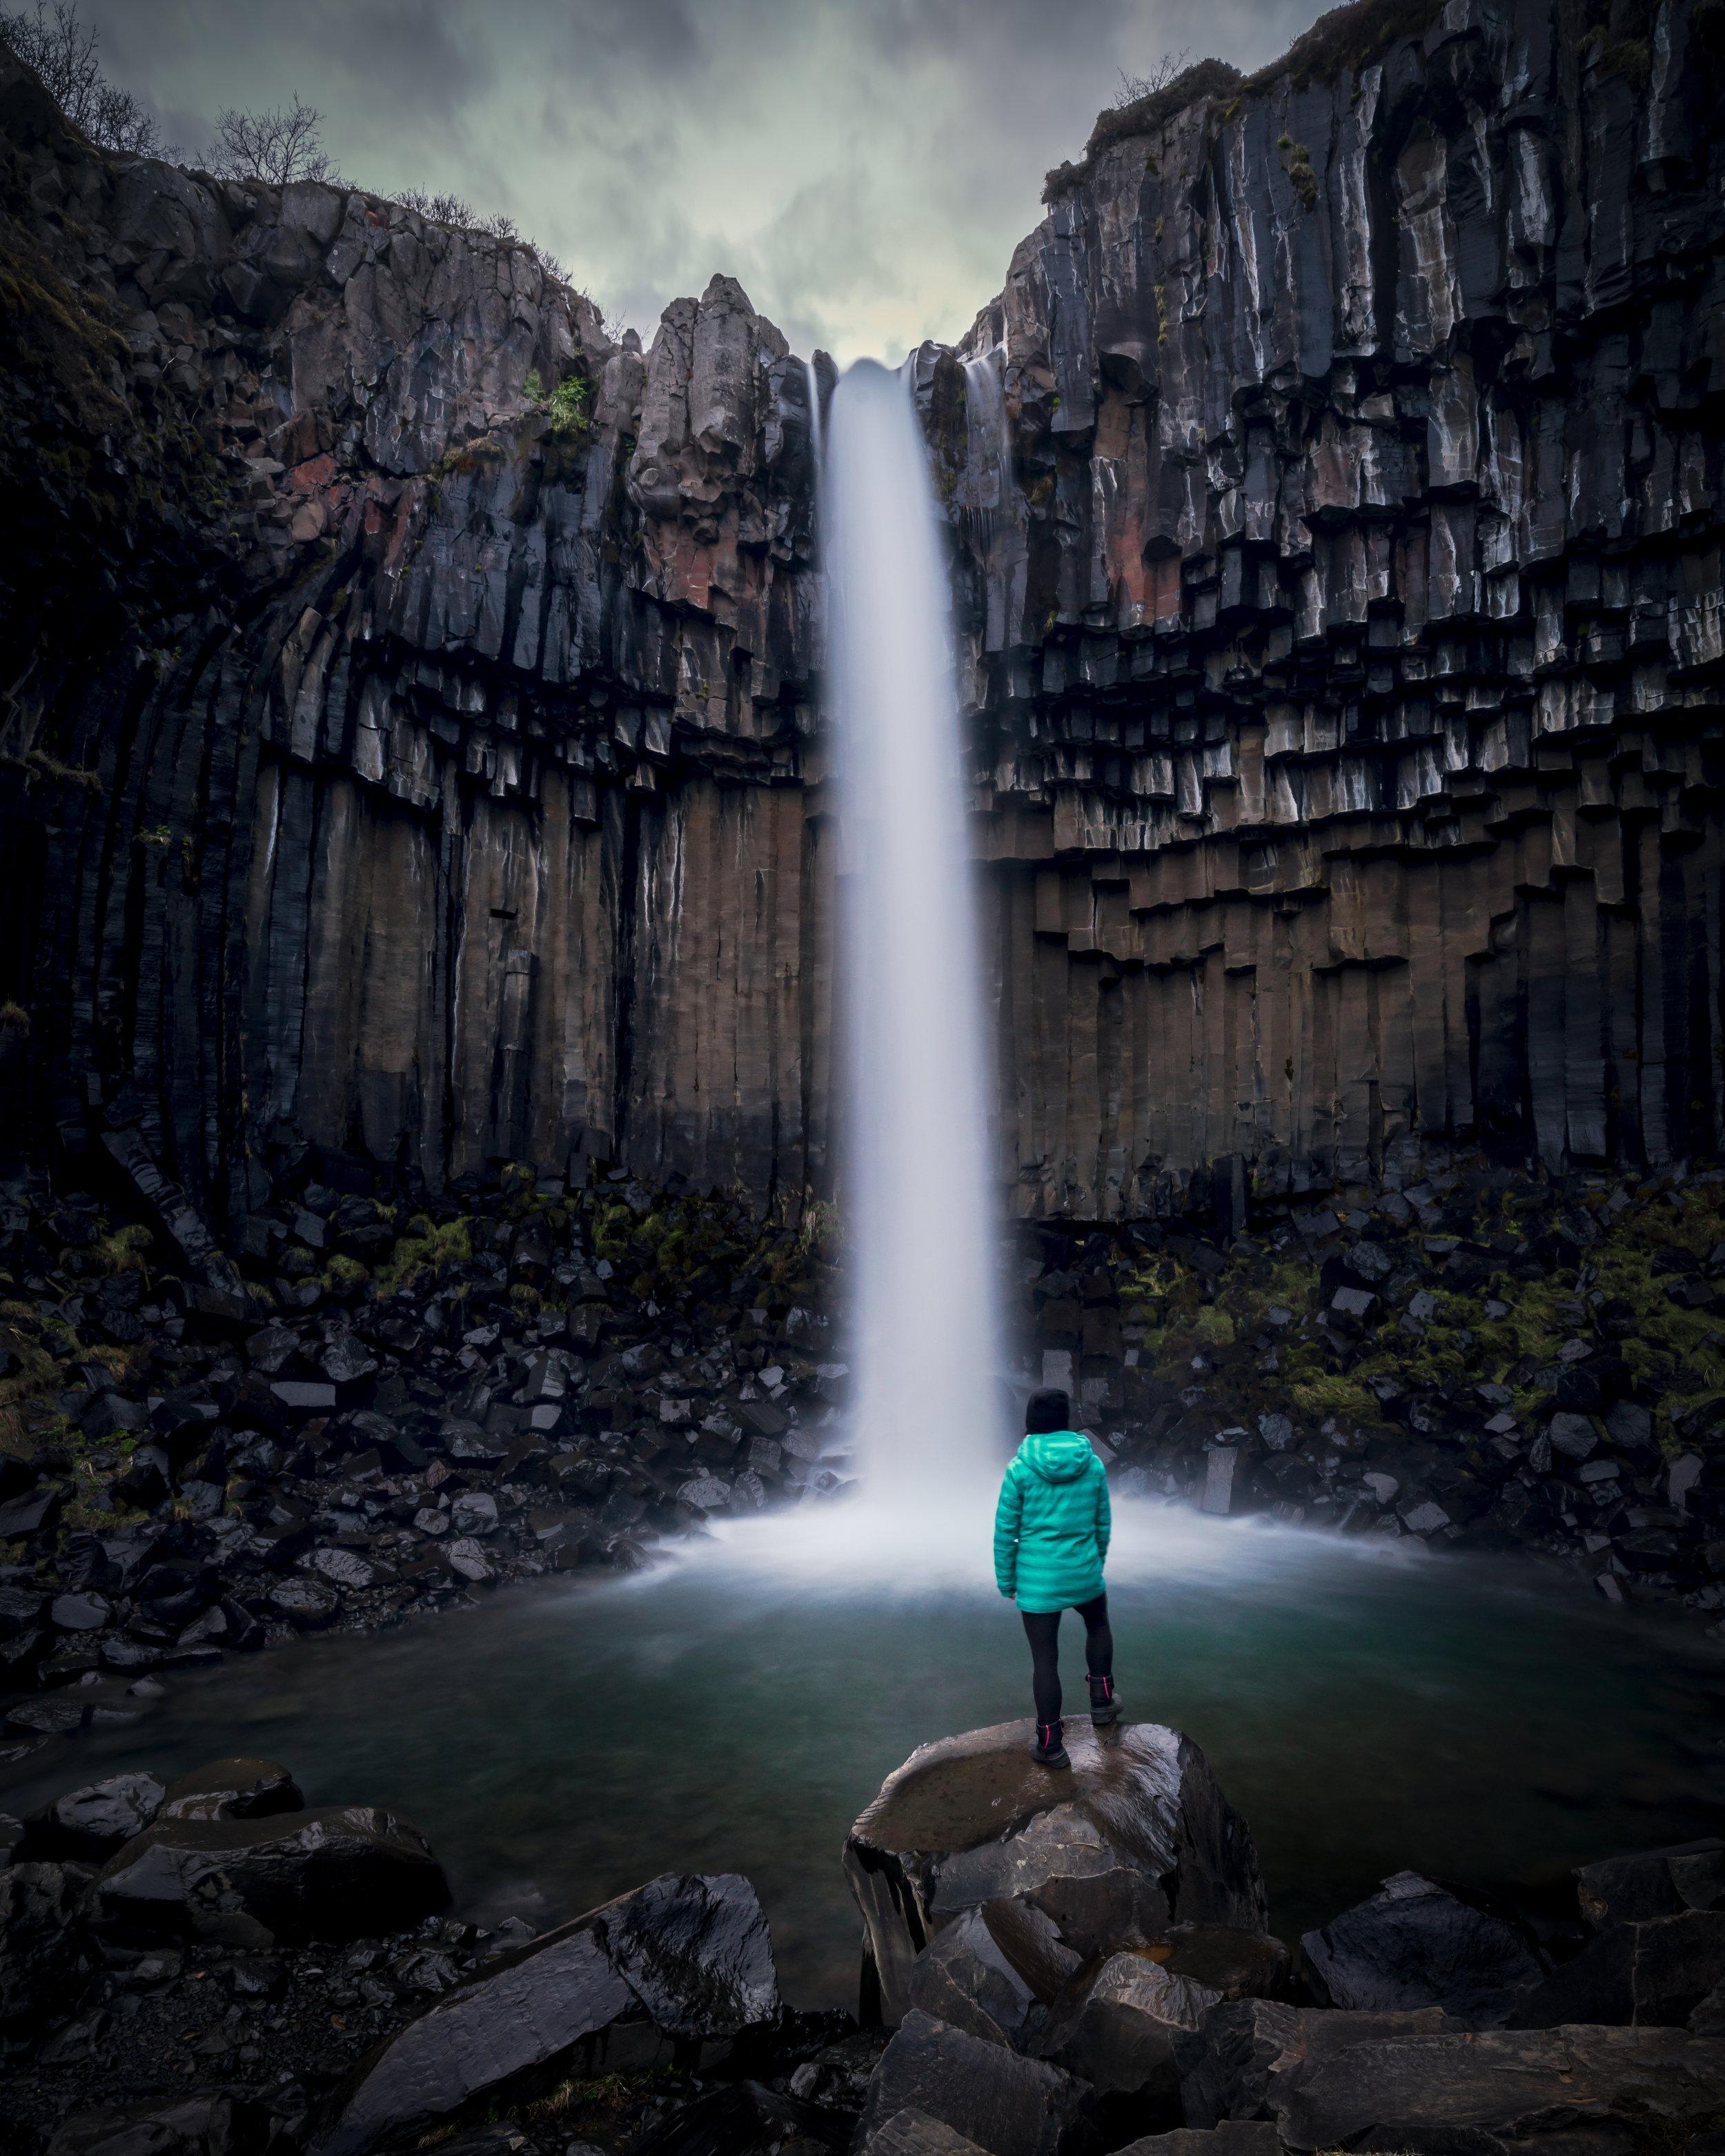 Becca-Iceland-waterfall-slowshutter.jpg